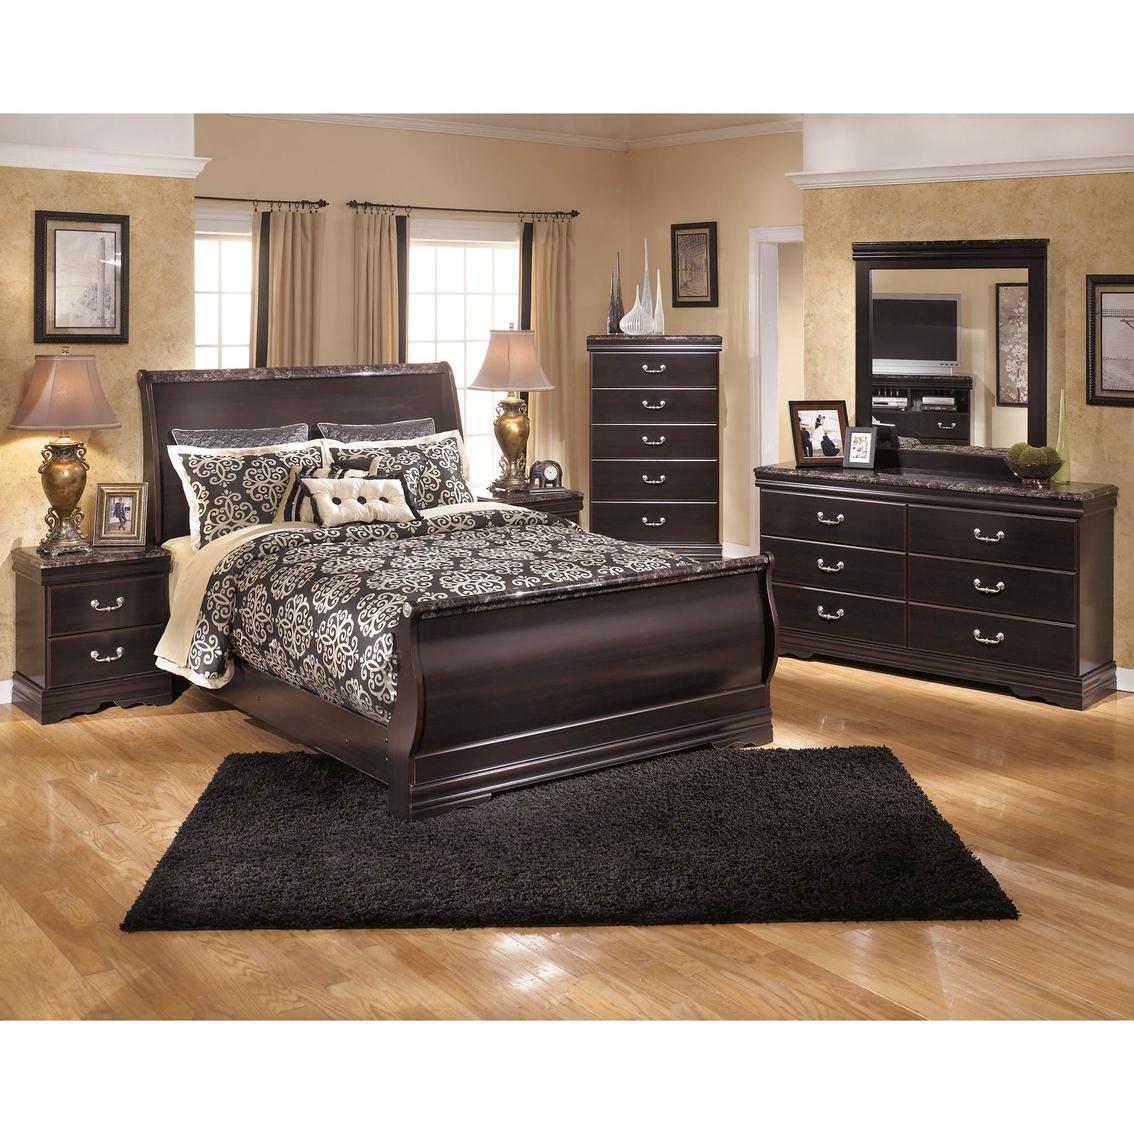 Signature Design By Ashley Esmarelda Sleigh Bed 5 Pc. Bedroom Set